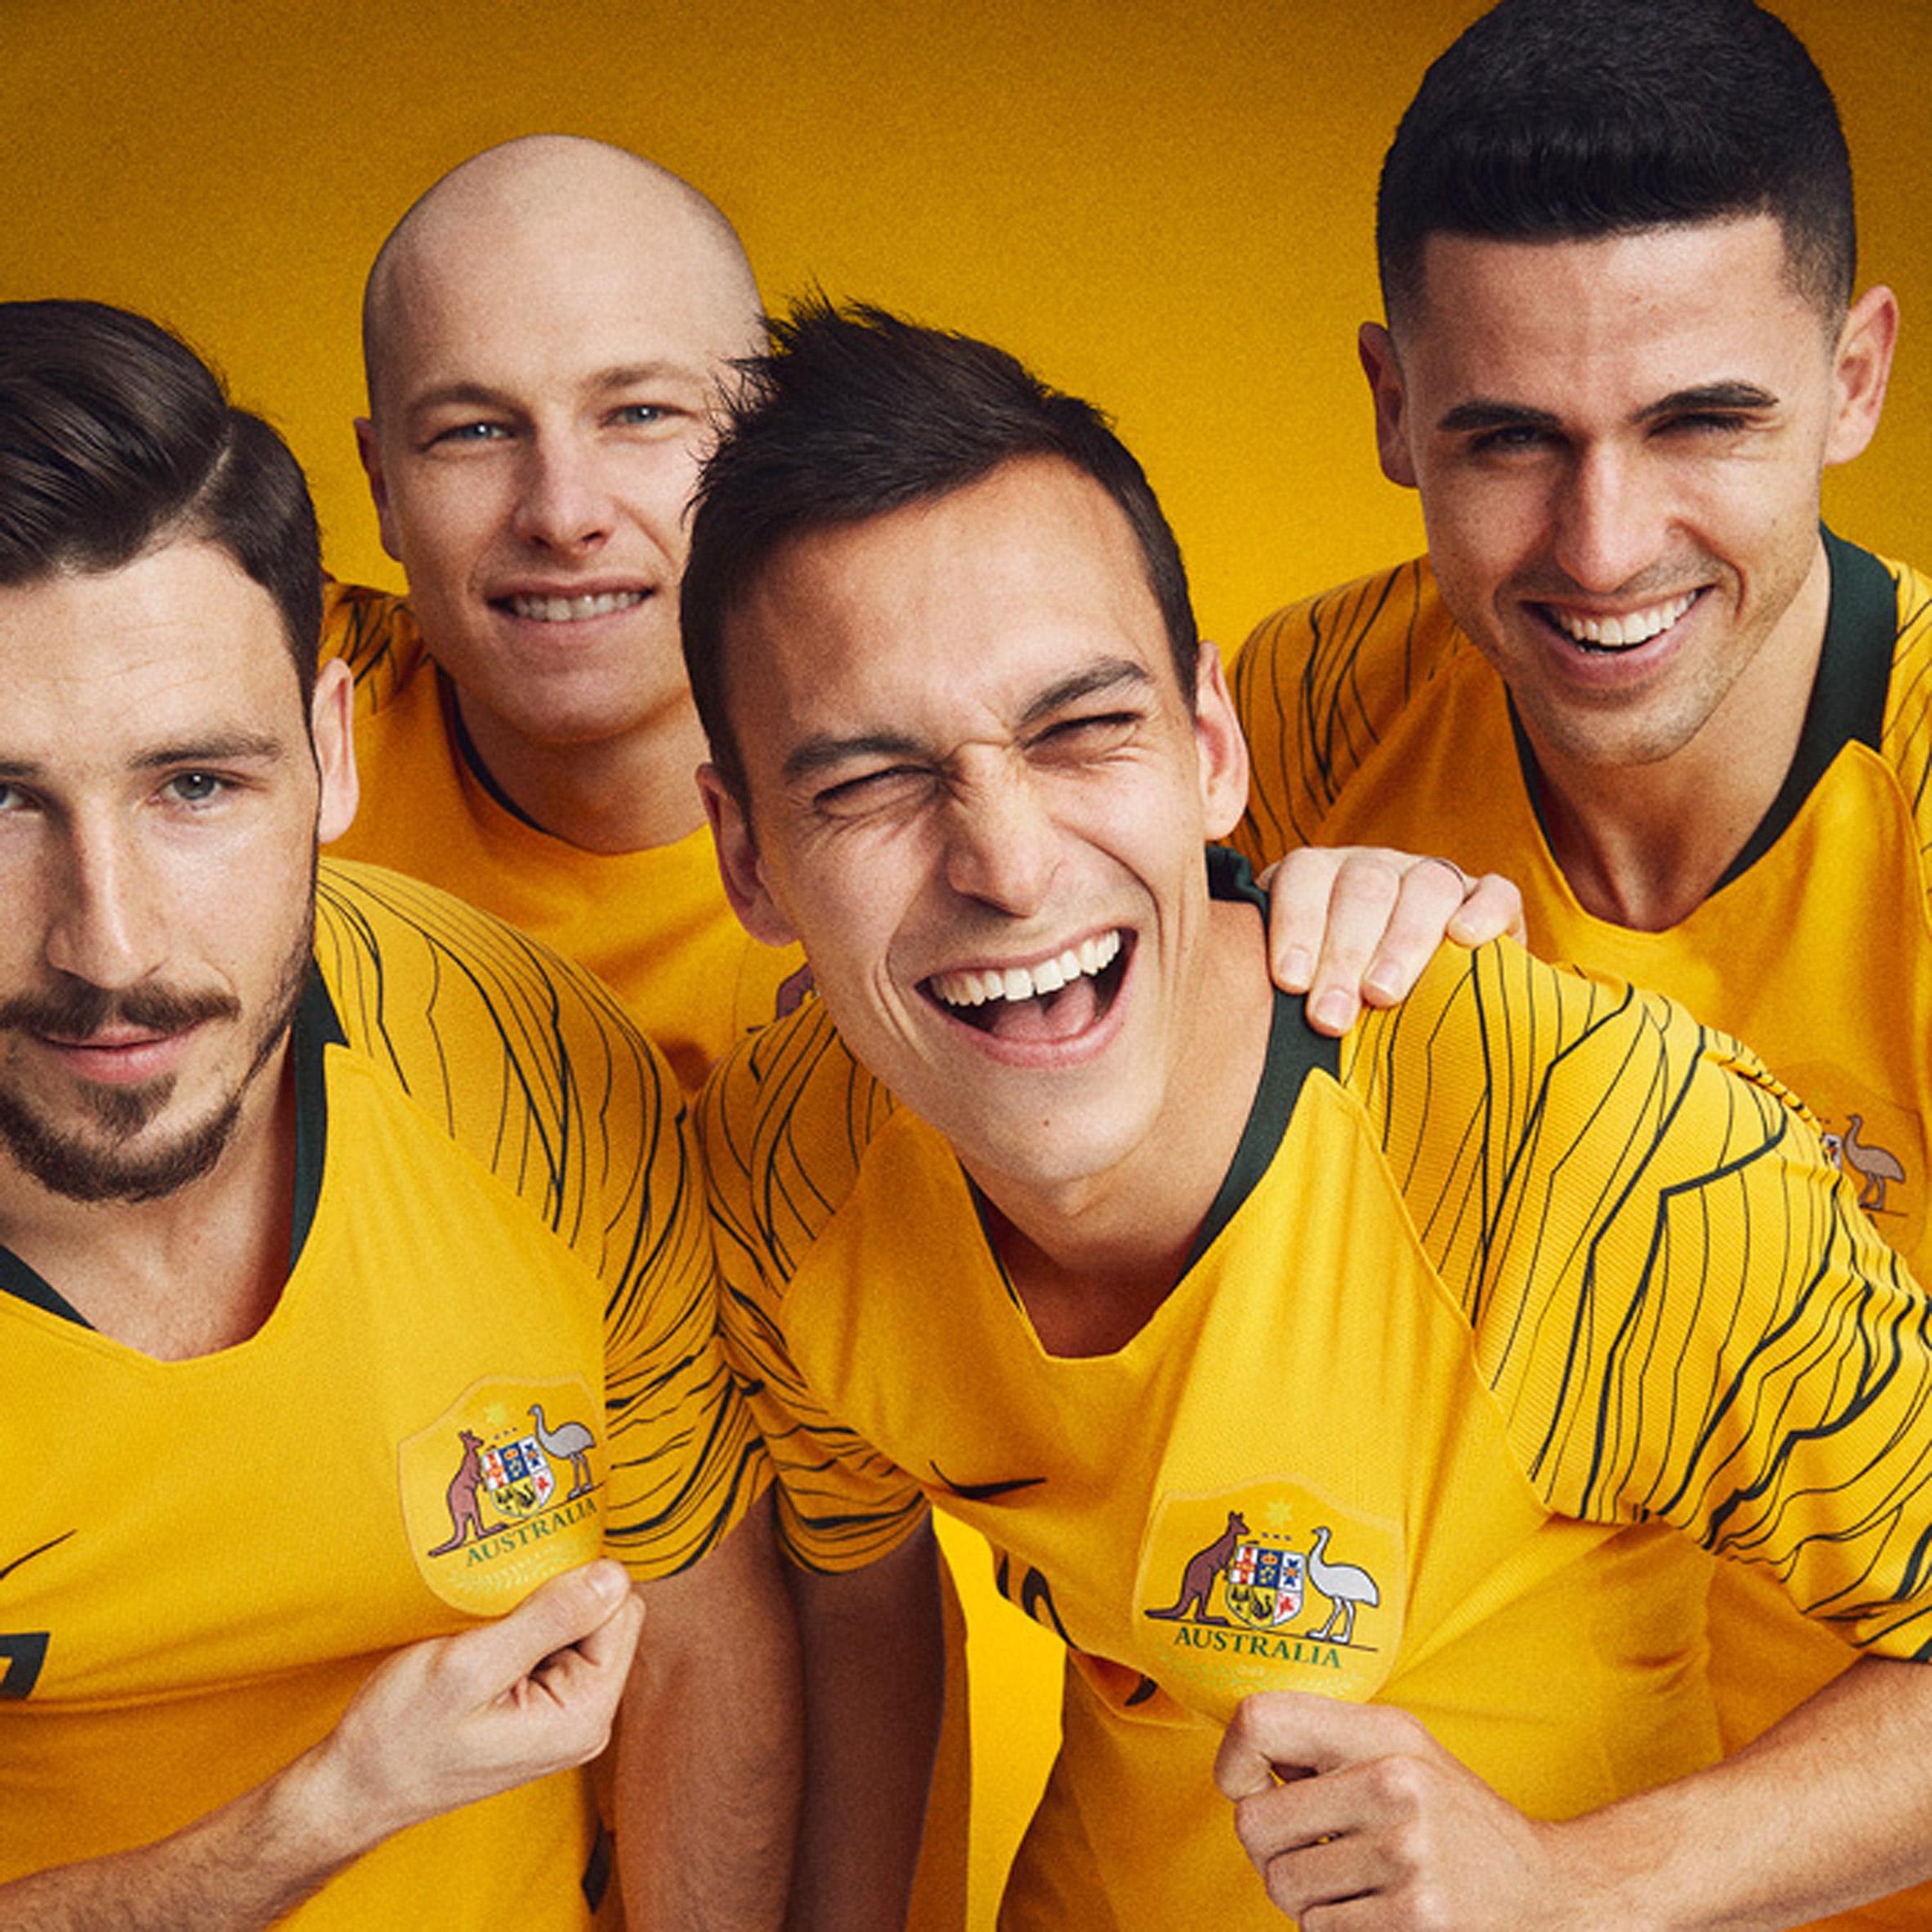 World Cup Australia Kit 2018